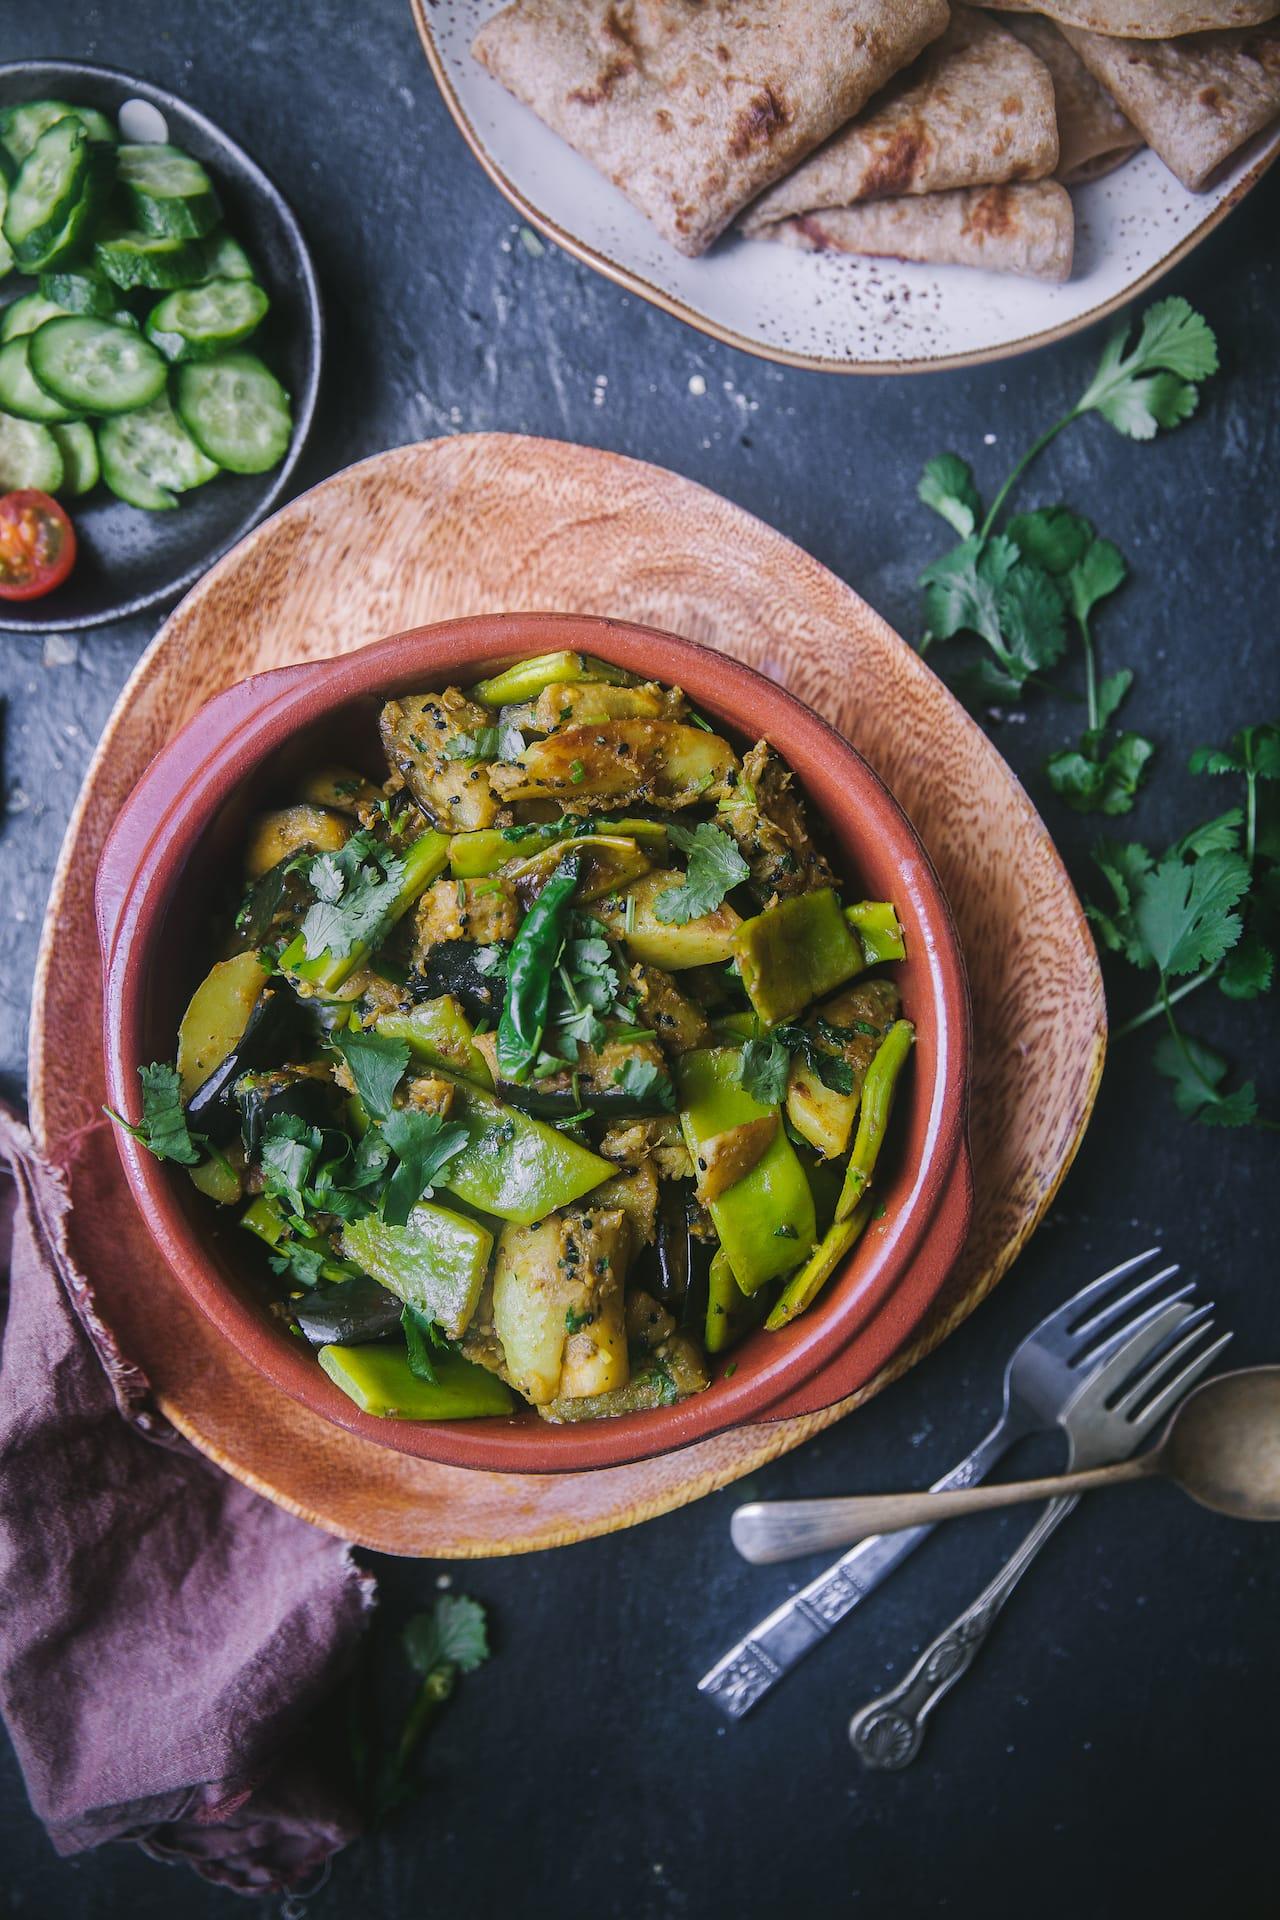 It's a Vegetarian, Plant Based side dish, from the region of Kolkata! Shim Begun'er Chorchori (Flat Green Beans and Eggplant Stir-Fried) #playfulcooking #bengali #vegetarian #plantbased, #chorchori #foodphotography